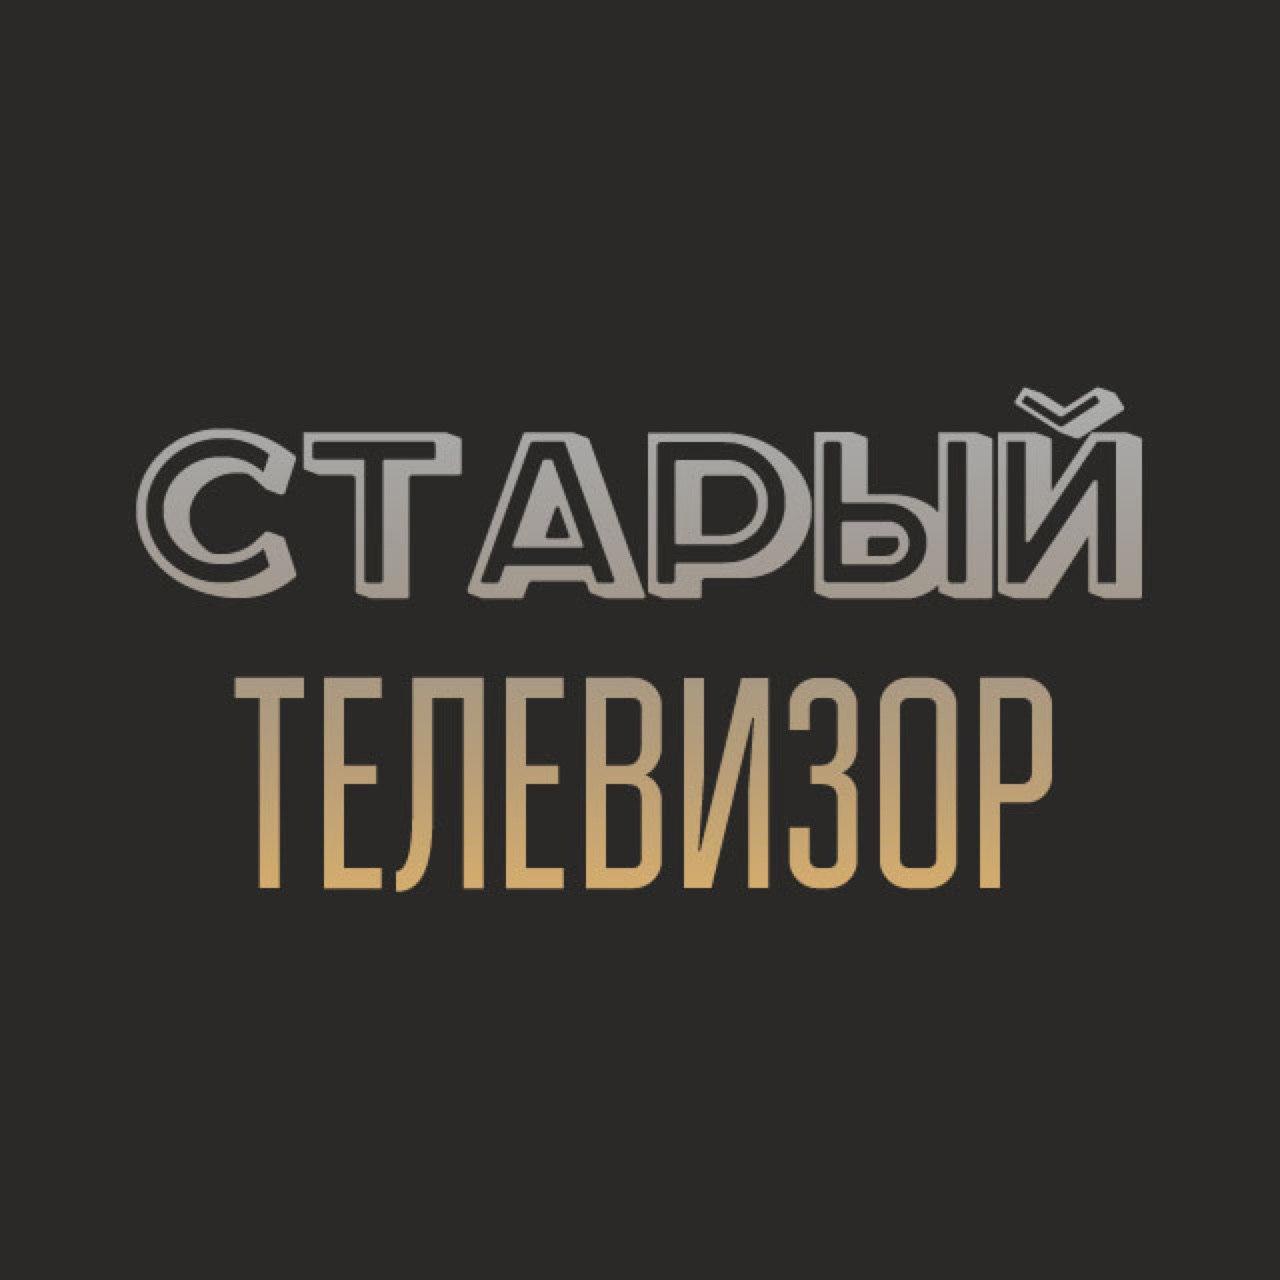 У «Старого телевизора» появился Telegram-канал